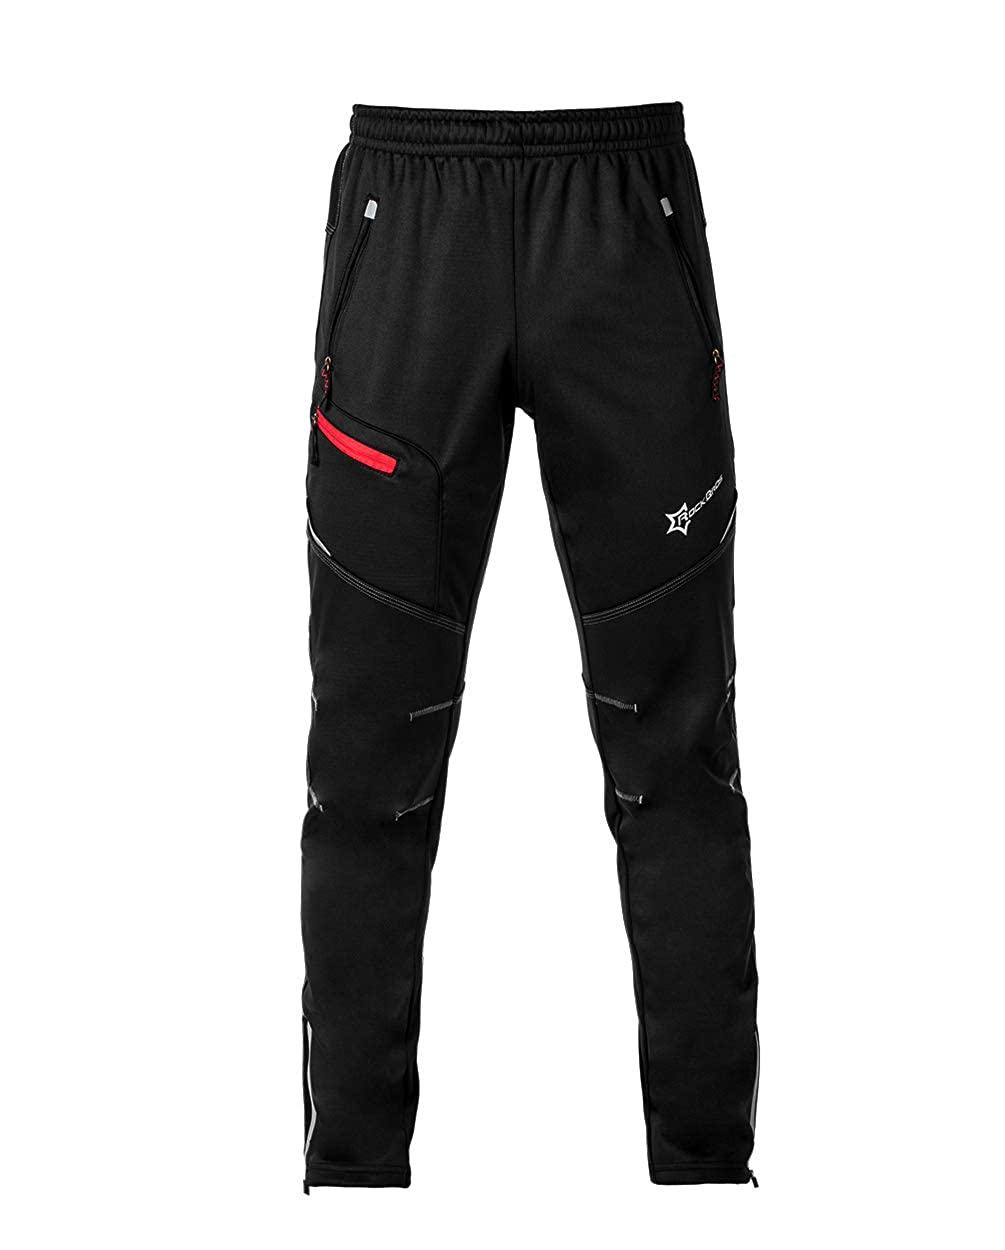 ROCK BROS Winter Cycling Pants for Men Thermal Fleece Windproof Bike Pants Running Biking Hiking